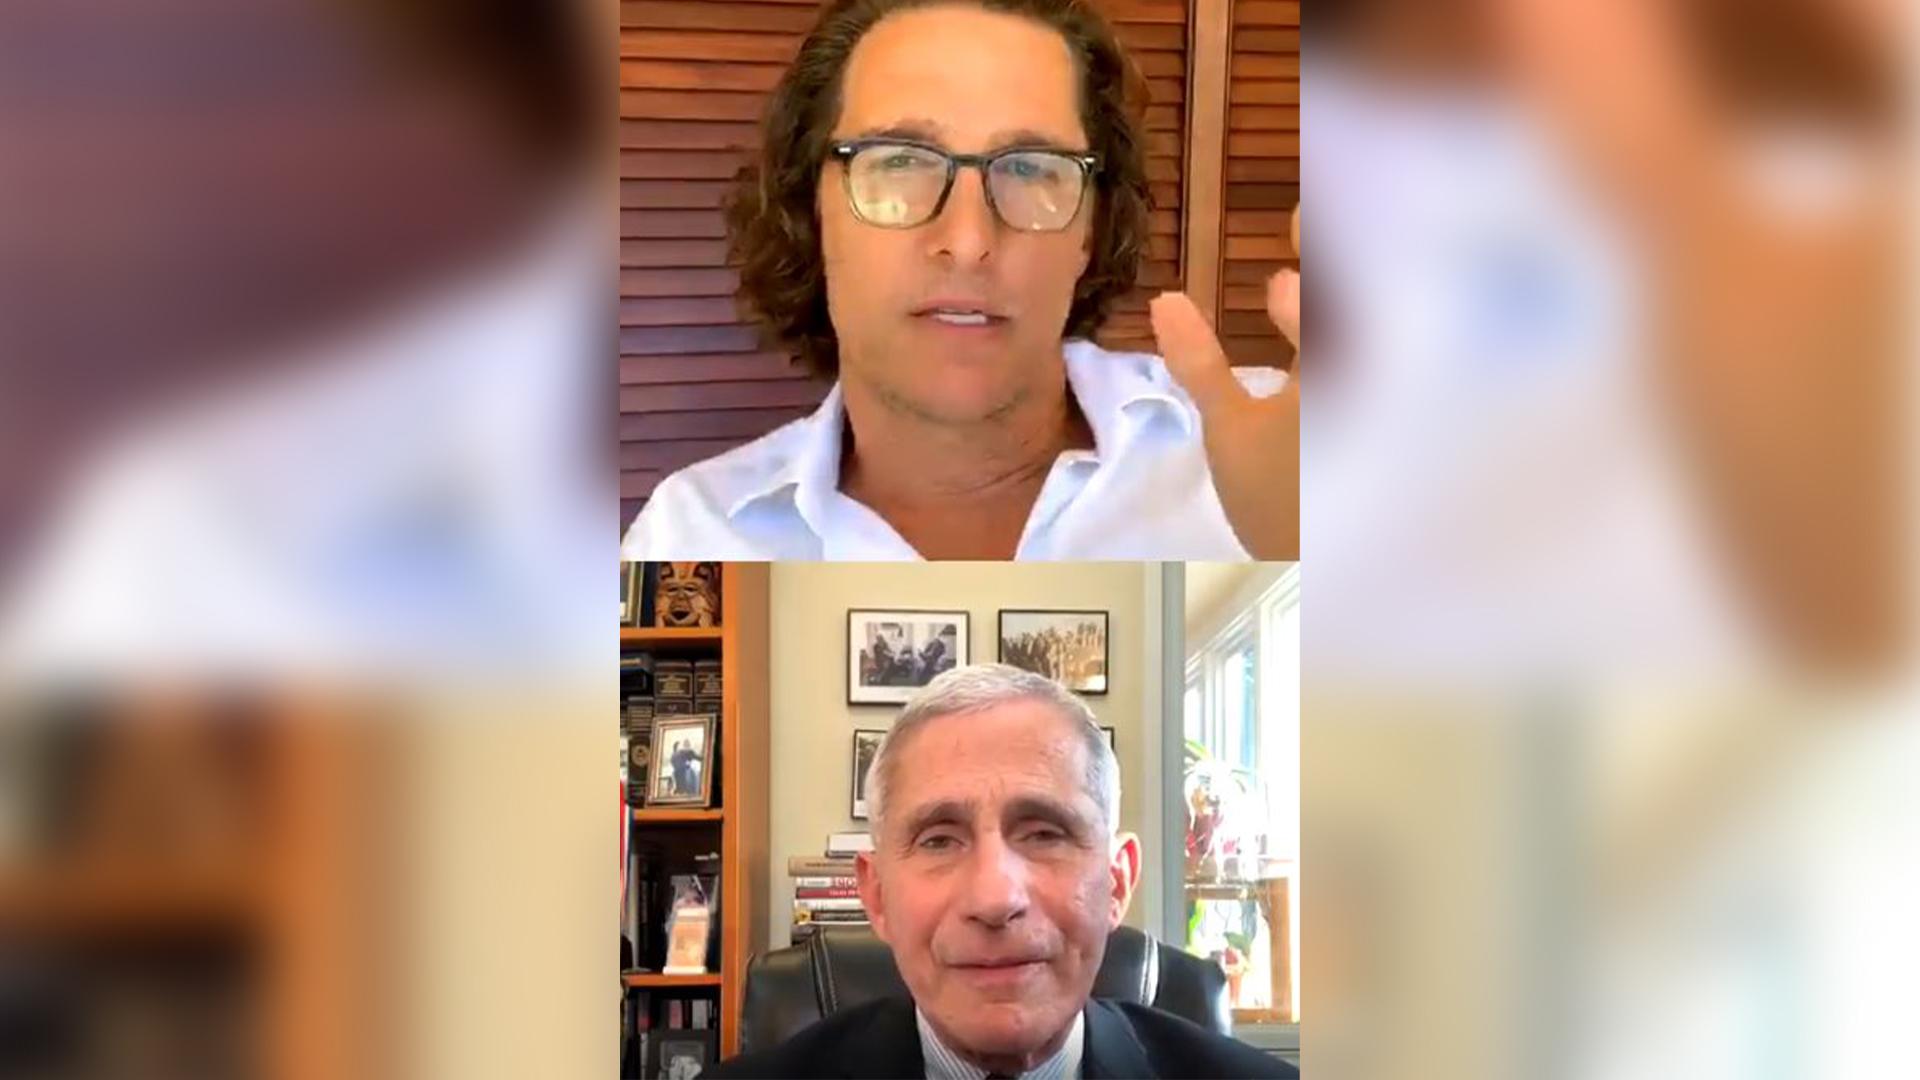 McConaughey fauci interview